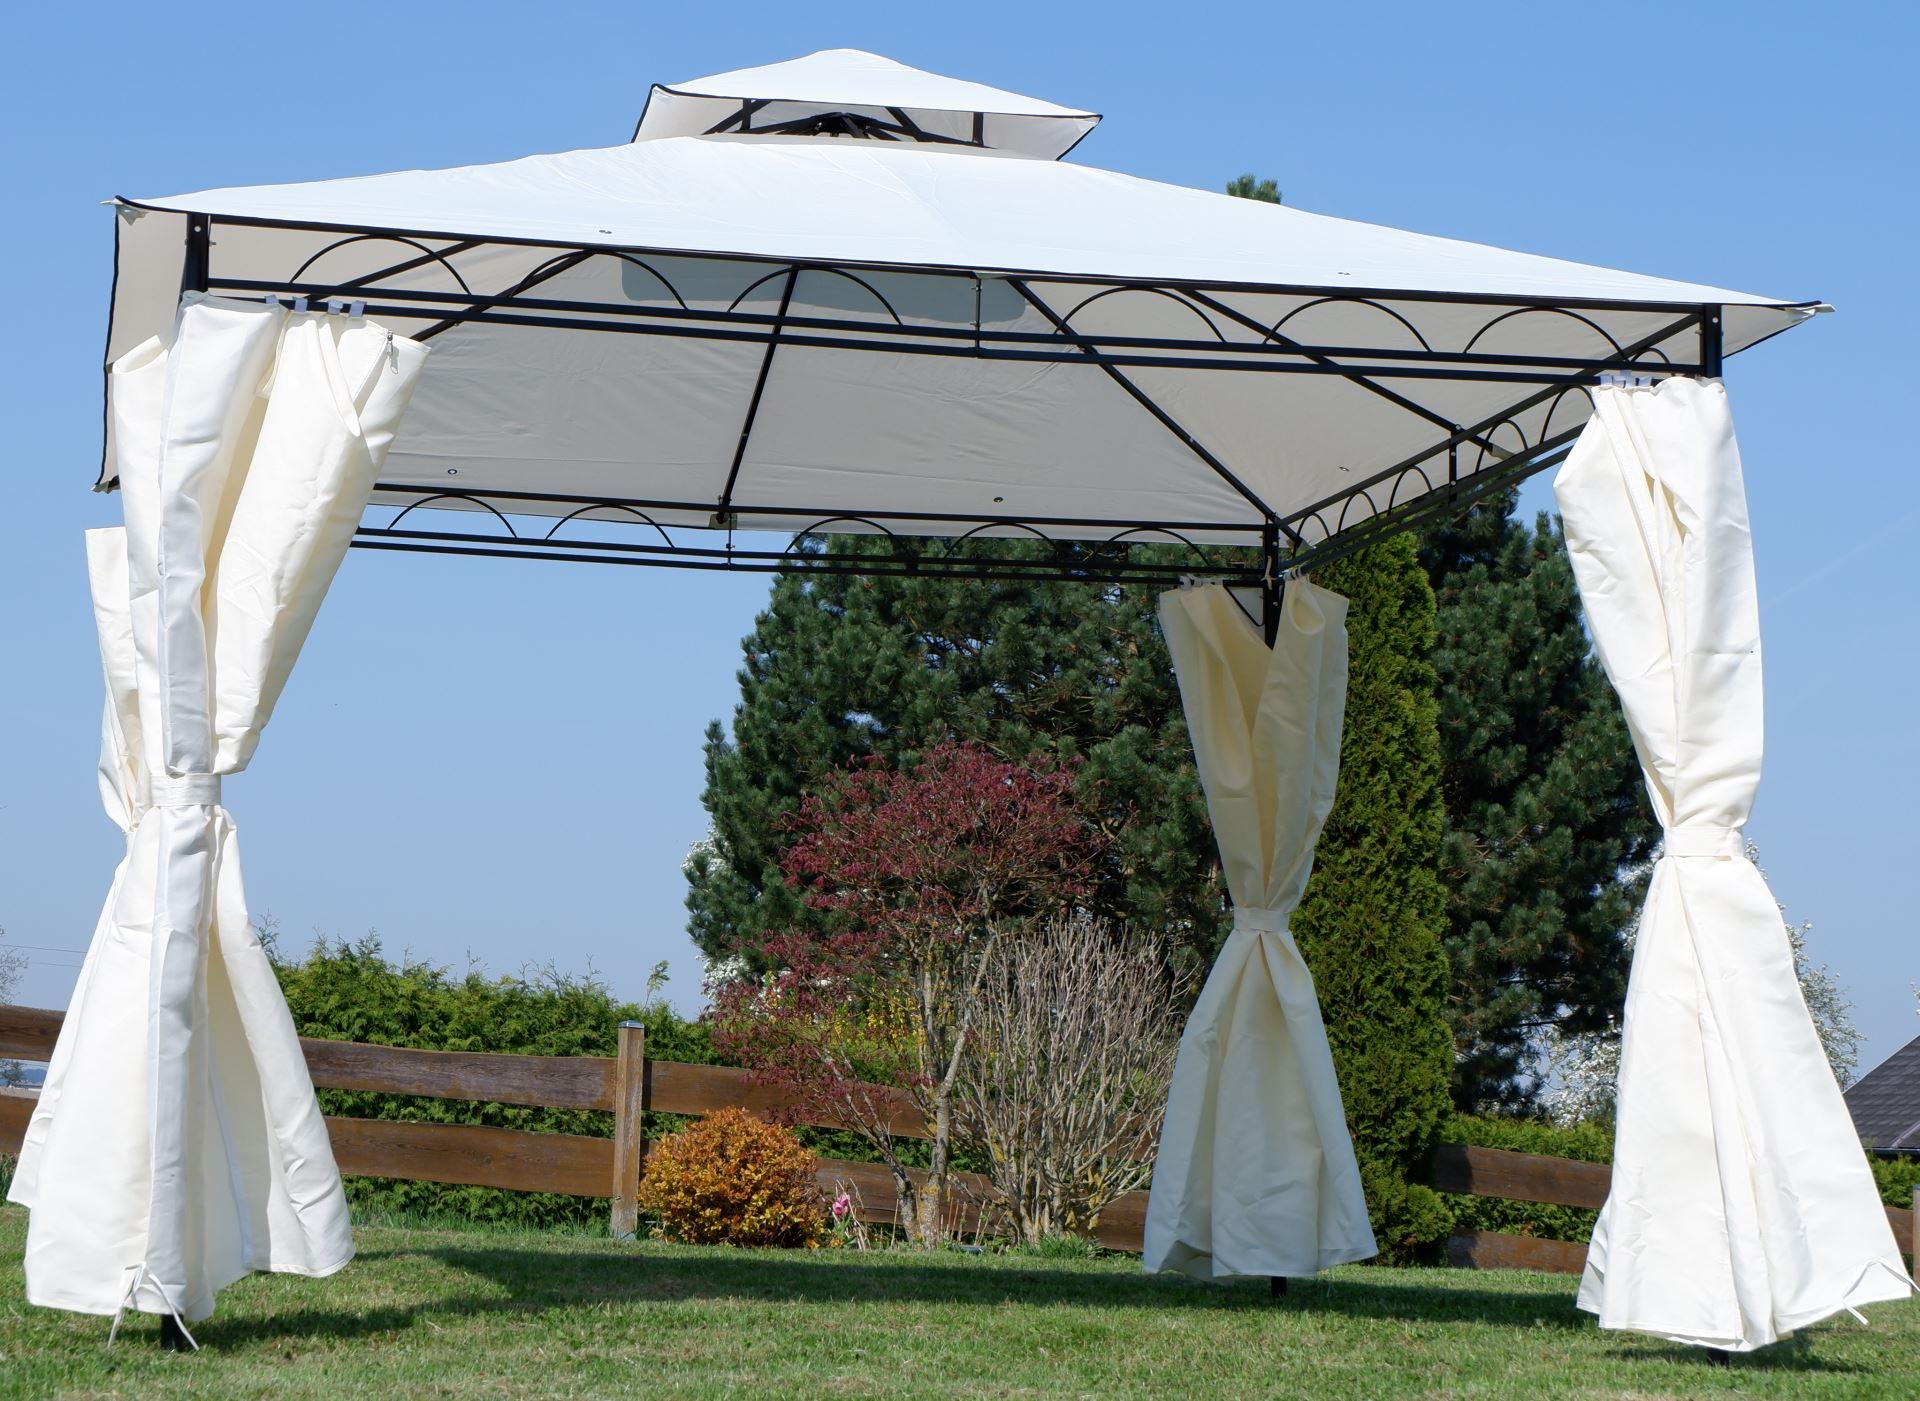 Full Size of Garten Pavillion Pavillon Holzdach Kaufen Gartenpavillon Aus Holz Metall Winterfest 3x3 Luxus Rund Glas Zelt Eleganter Meter Holzhaus Kind Wassertank Garten Garten Pavillion